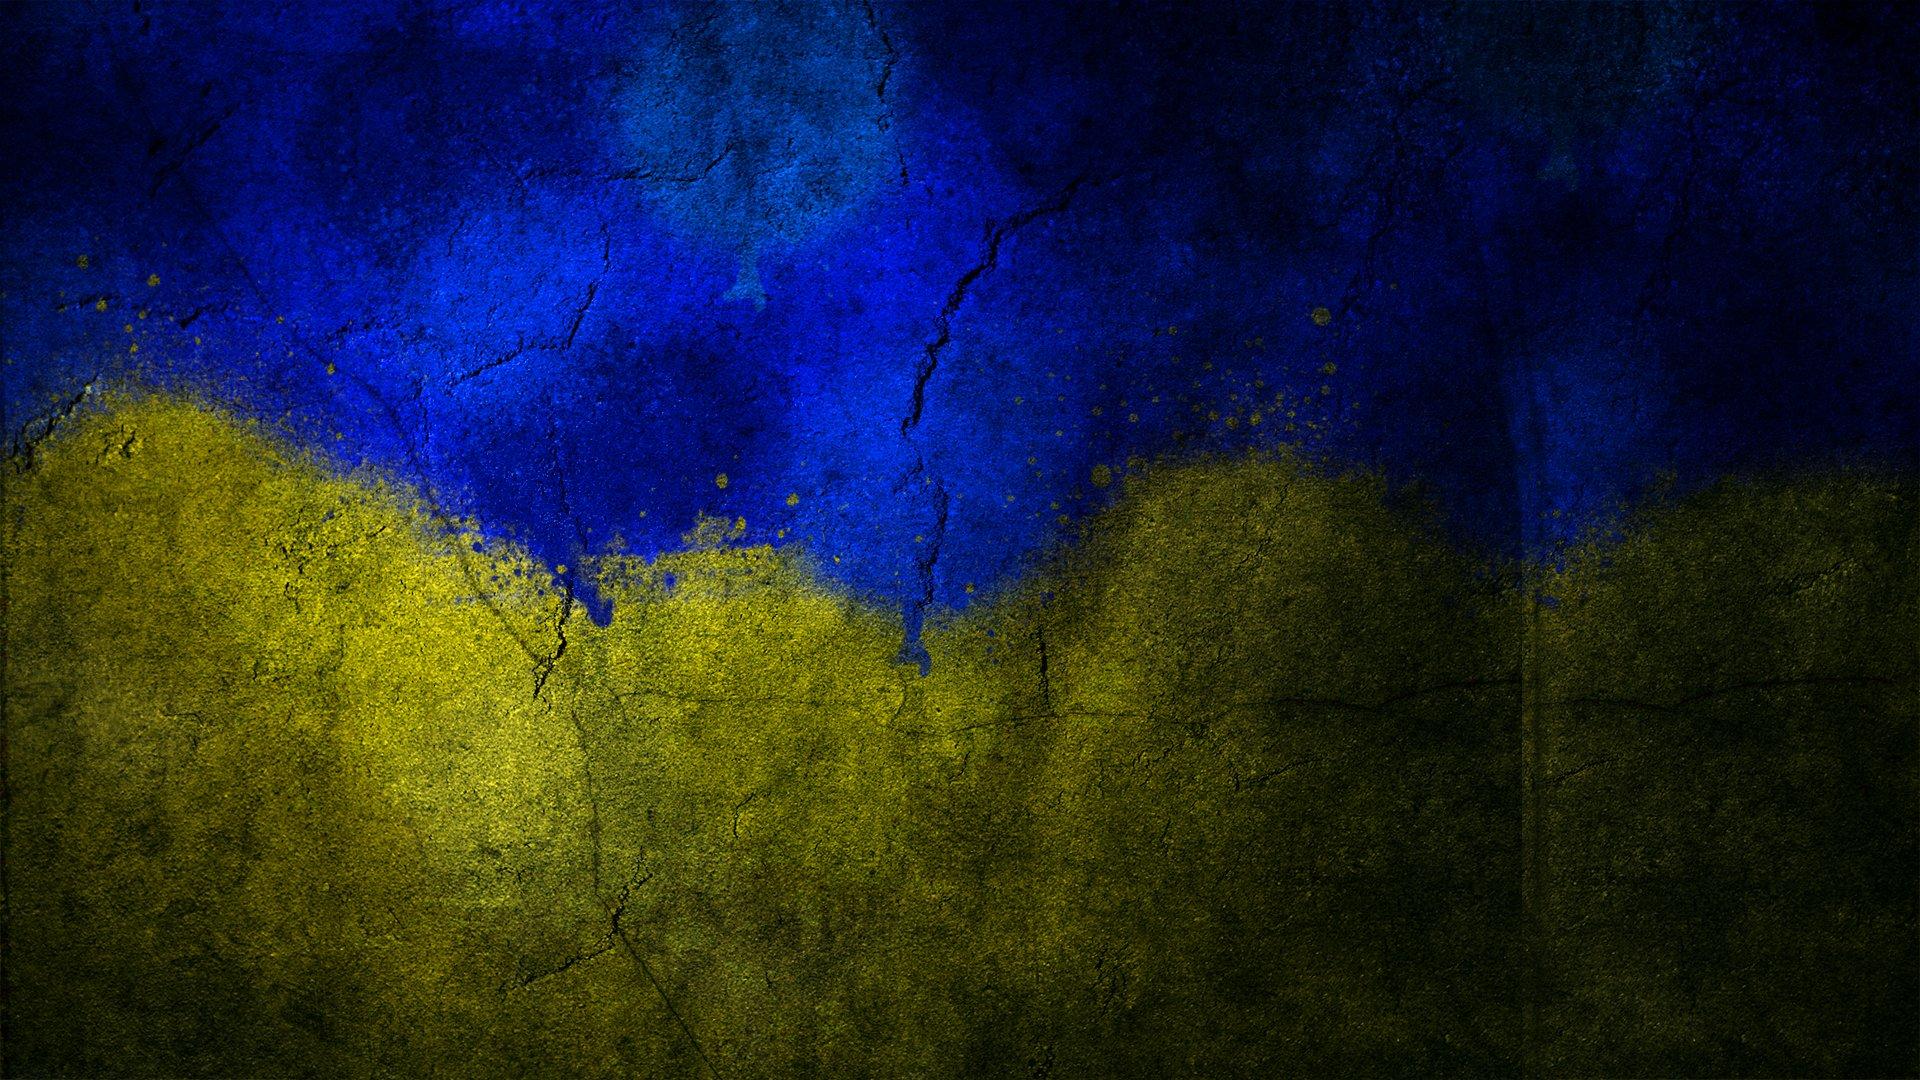 ukraine - HD1920×1080